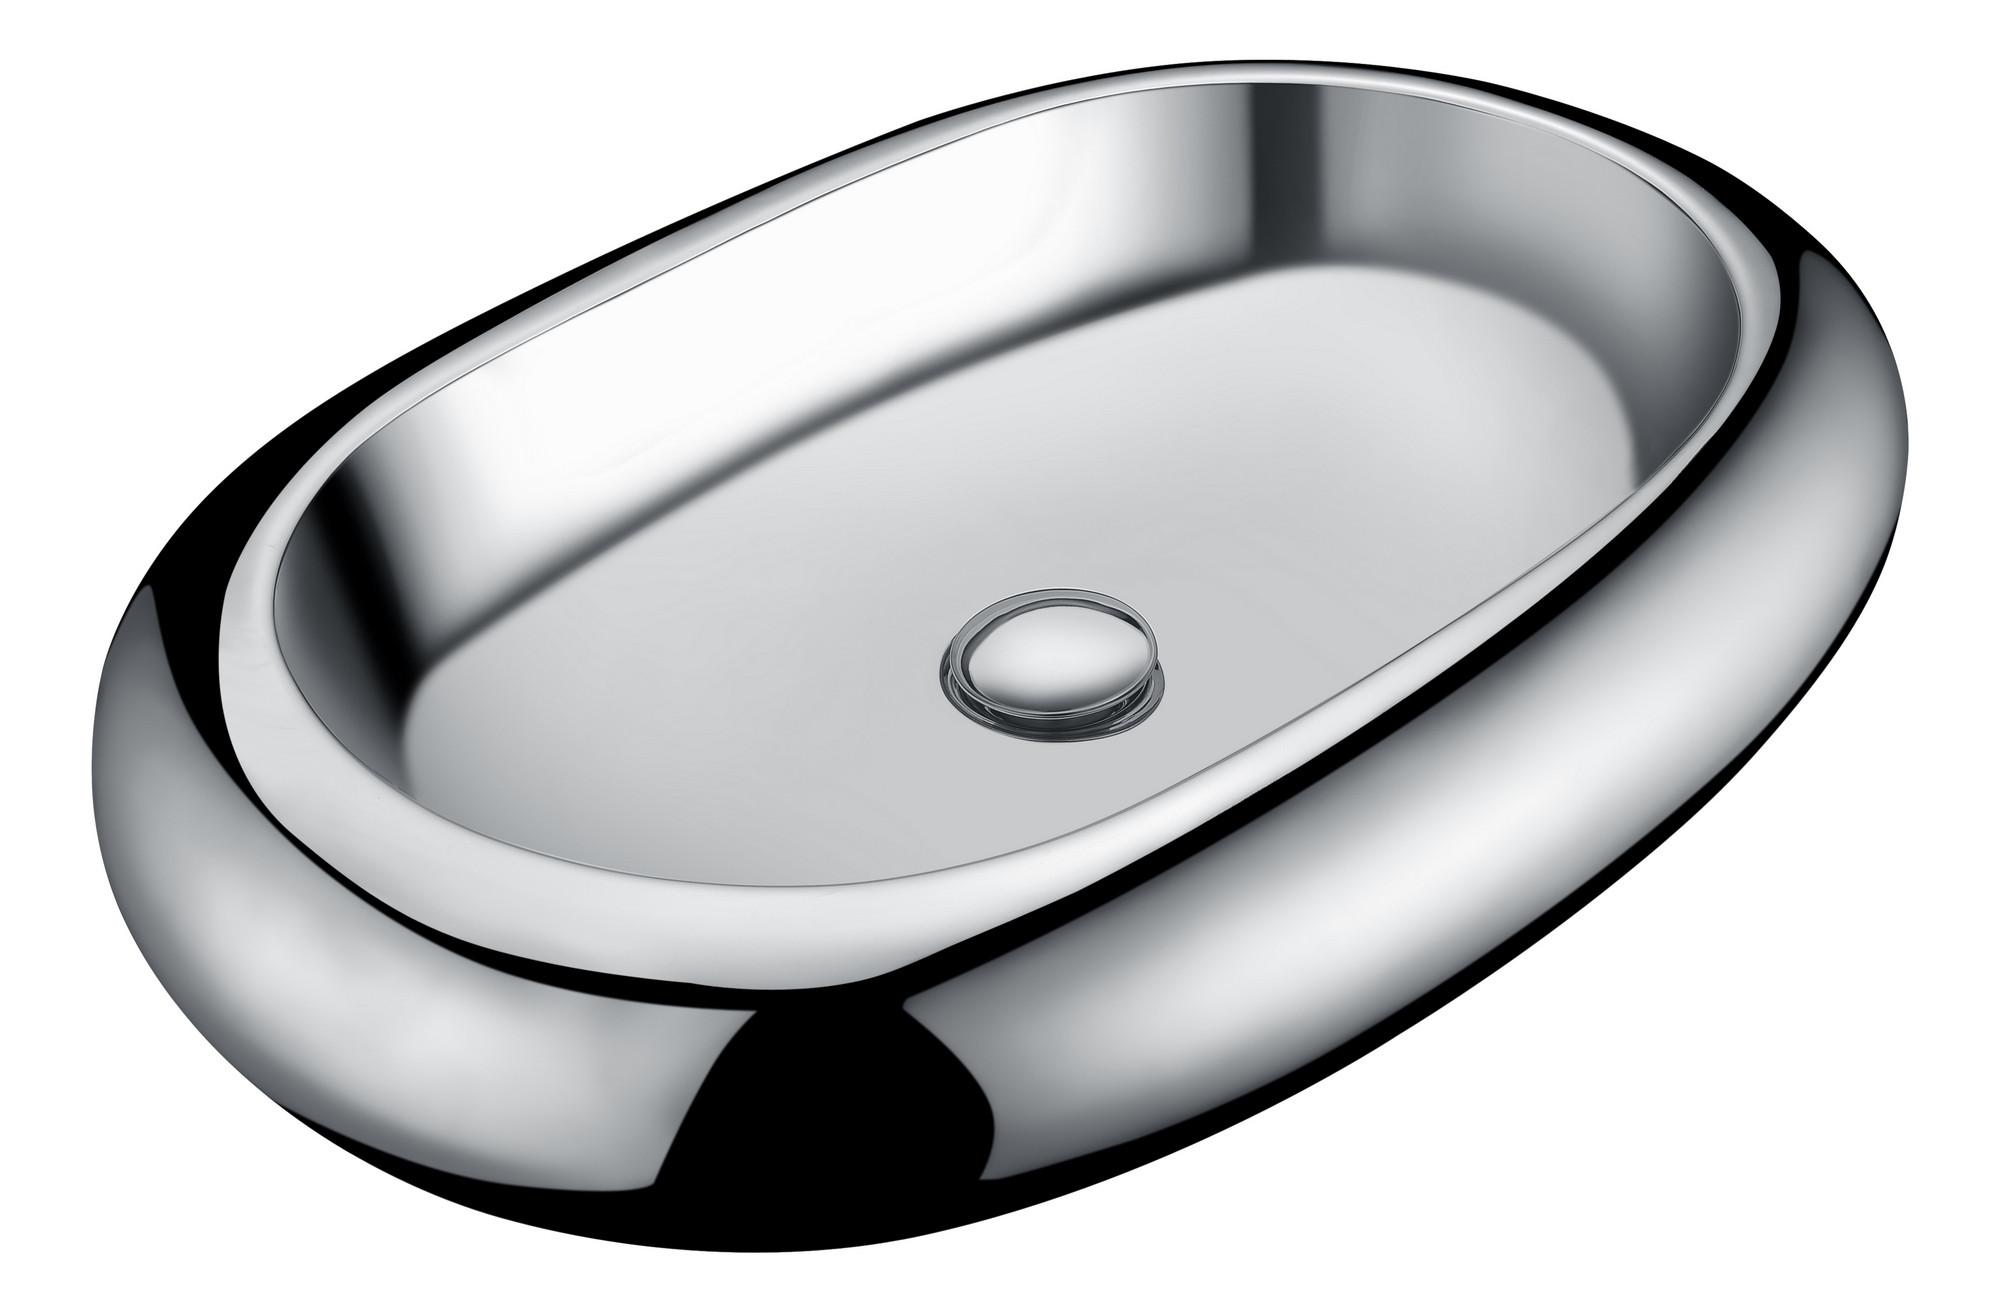 ANZZI LS-AZ269 Prussian Series Vitreous China Ceramic Vessel Sink In Silver